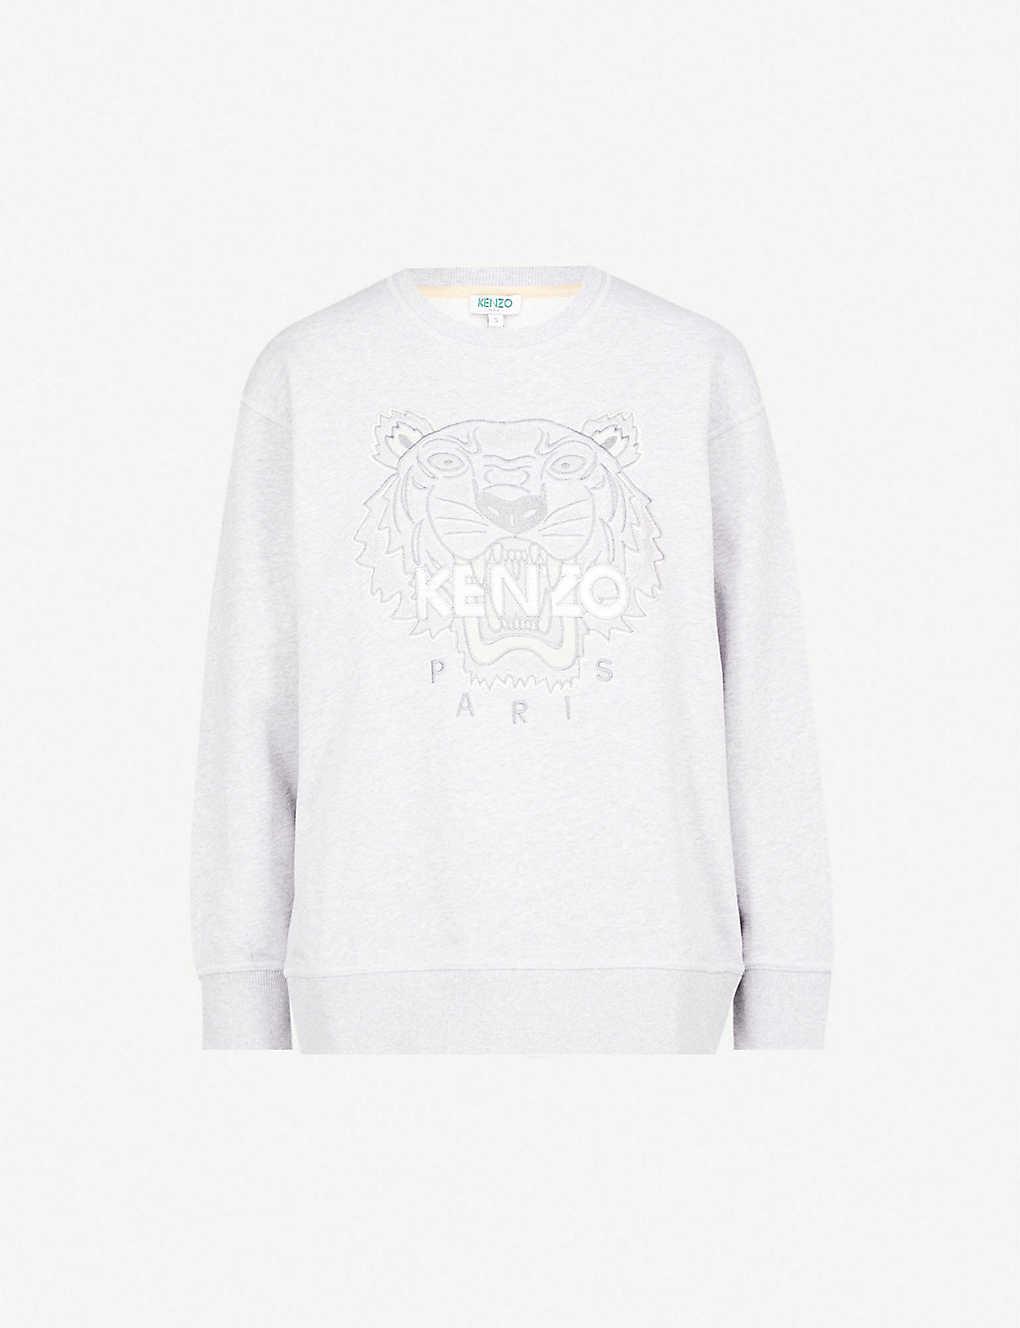 b2aaf120 KENZO - Tiger-embroidered cotton-jersey sweatshirt | Selfridges.com